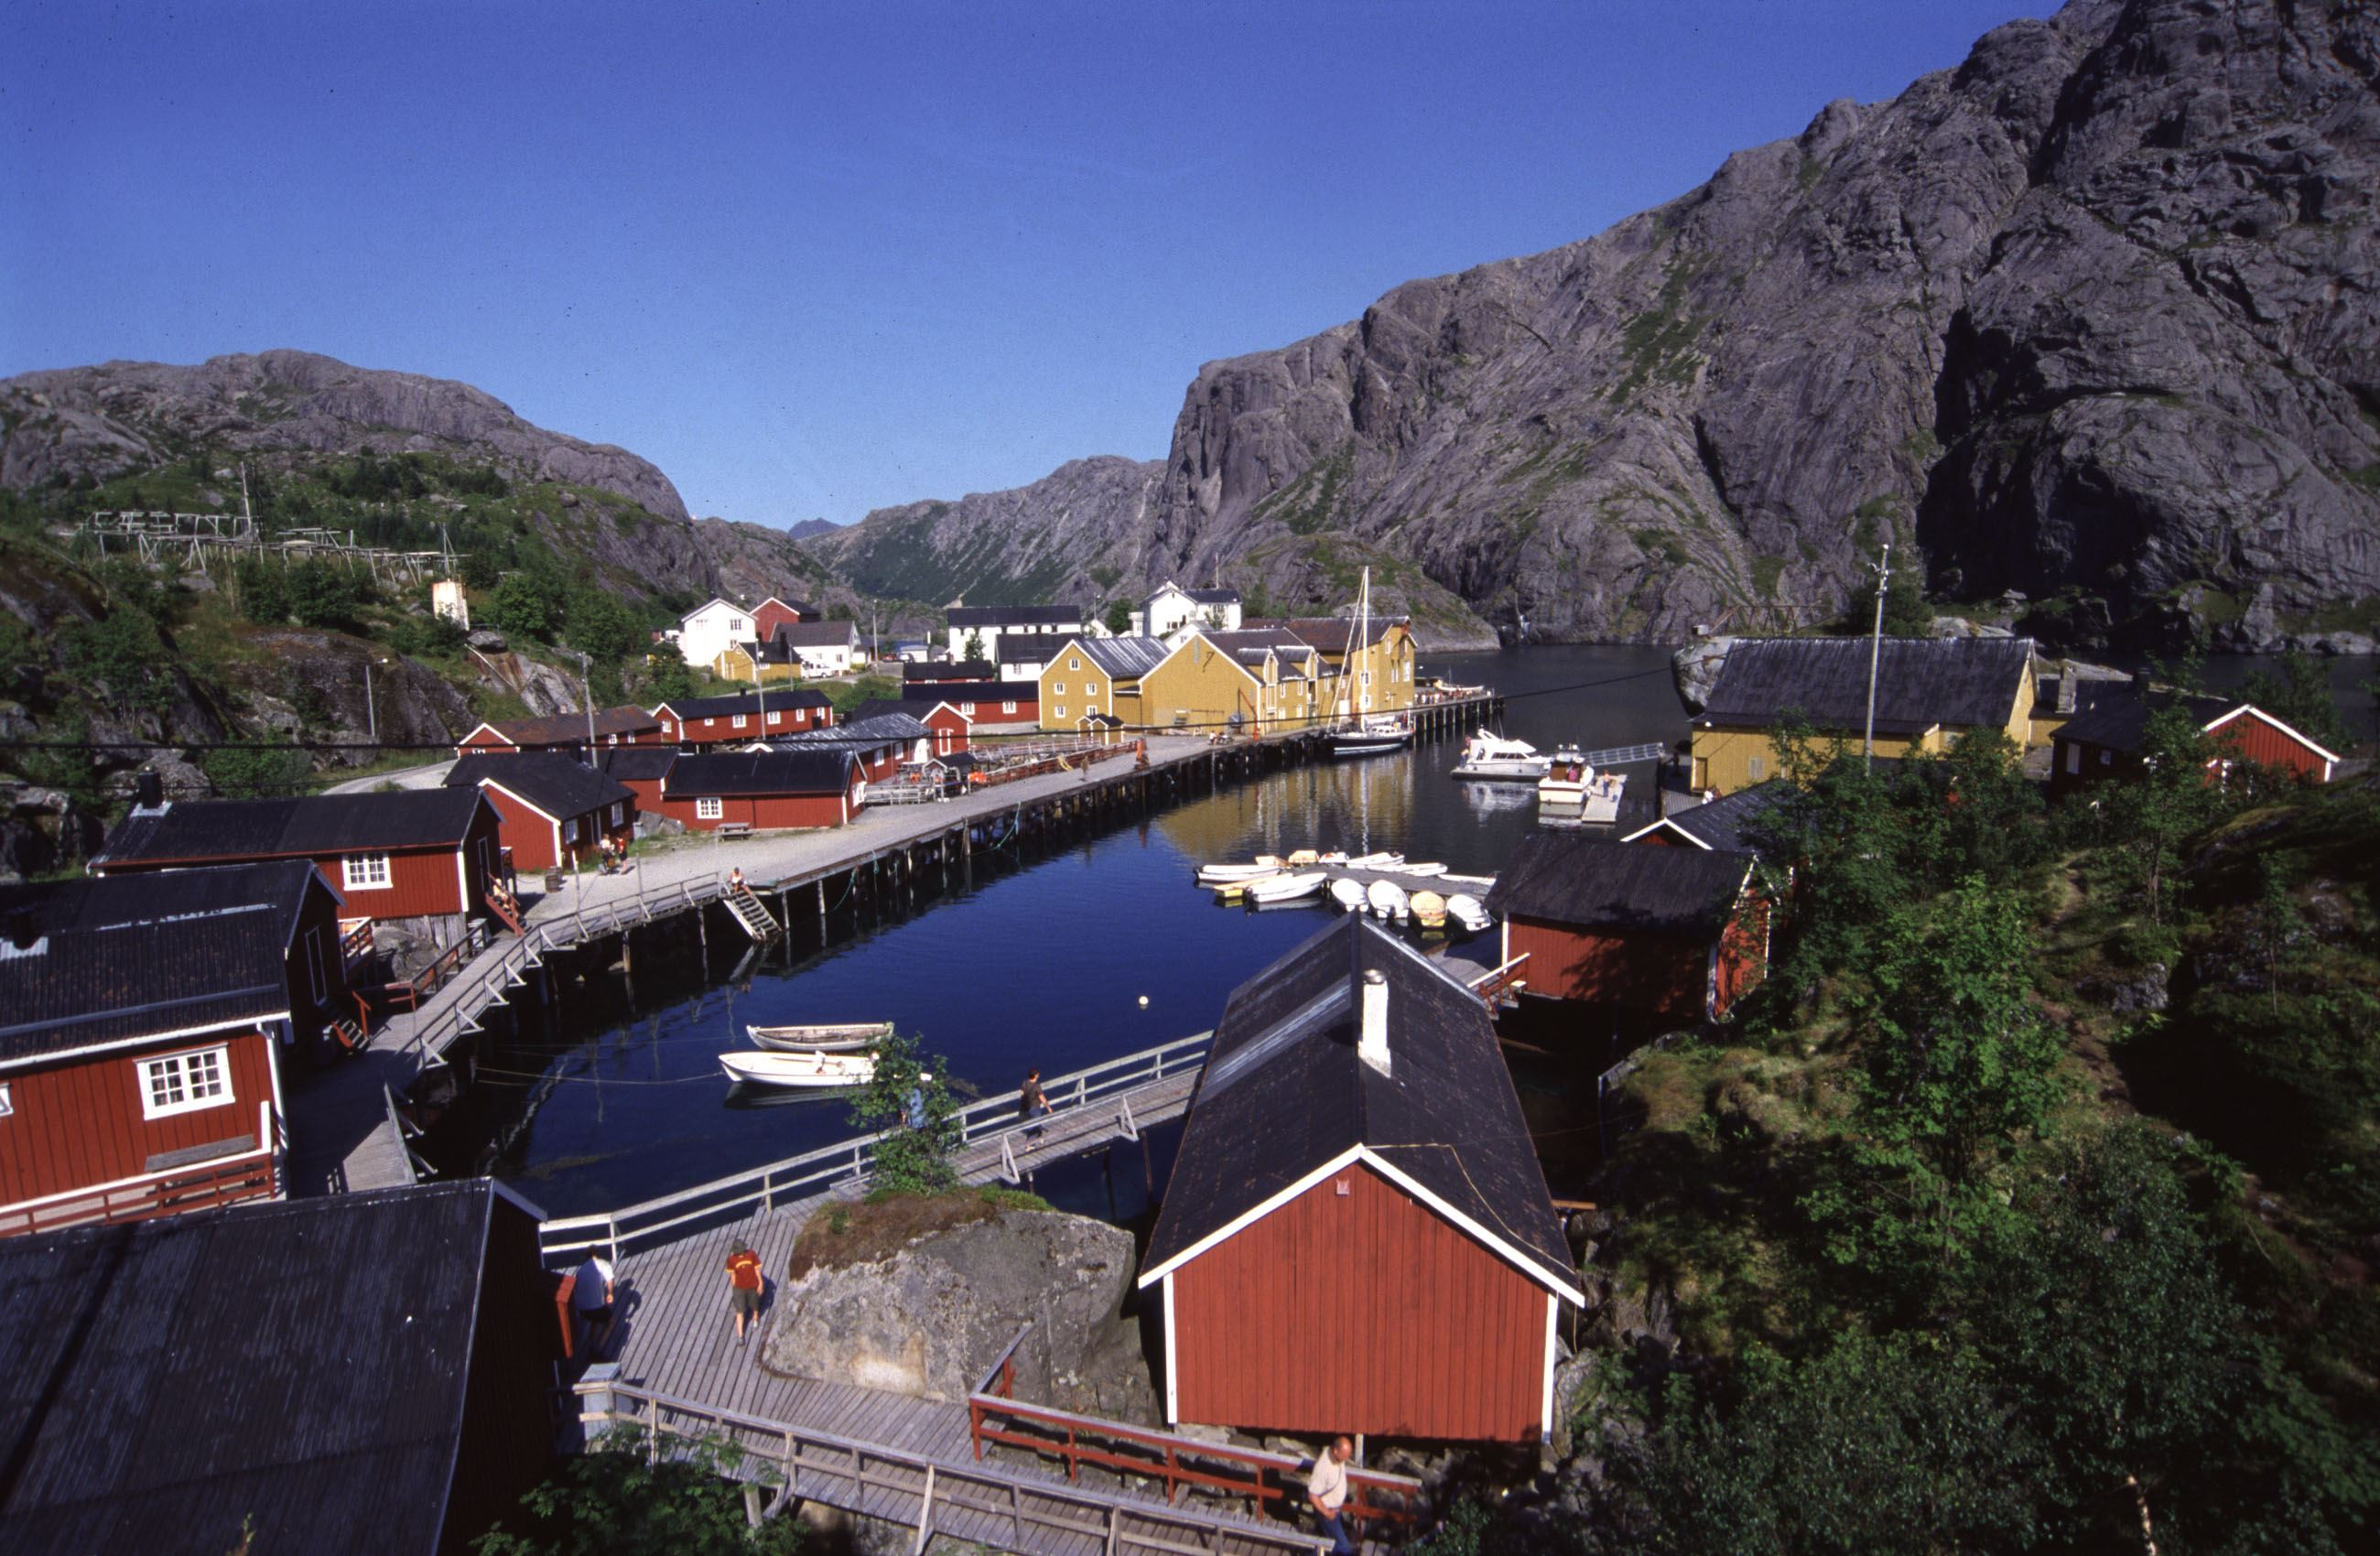 © Magne Myrvold, Sportfishing from Nusfjord